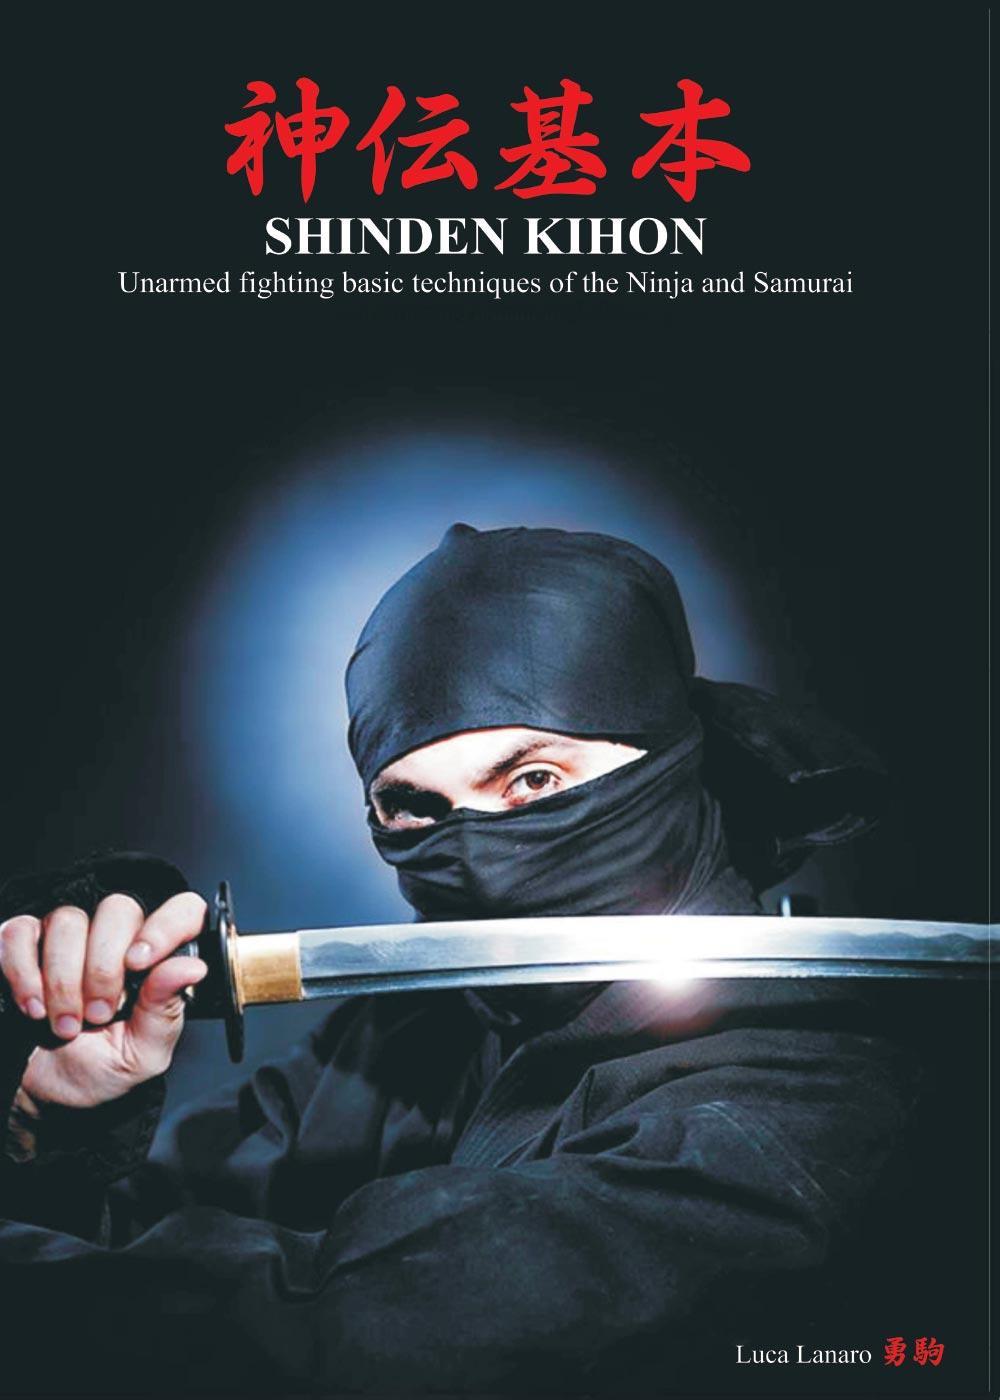 SHINDEN KIHON Unarmed fighting basic techniques of the Ninja and Samurai